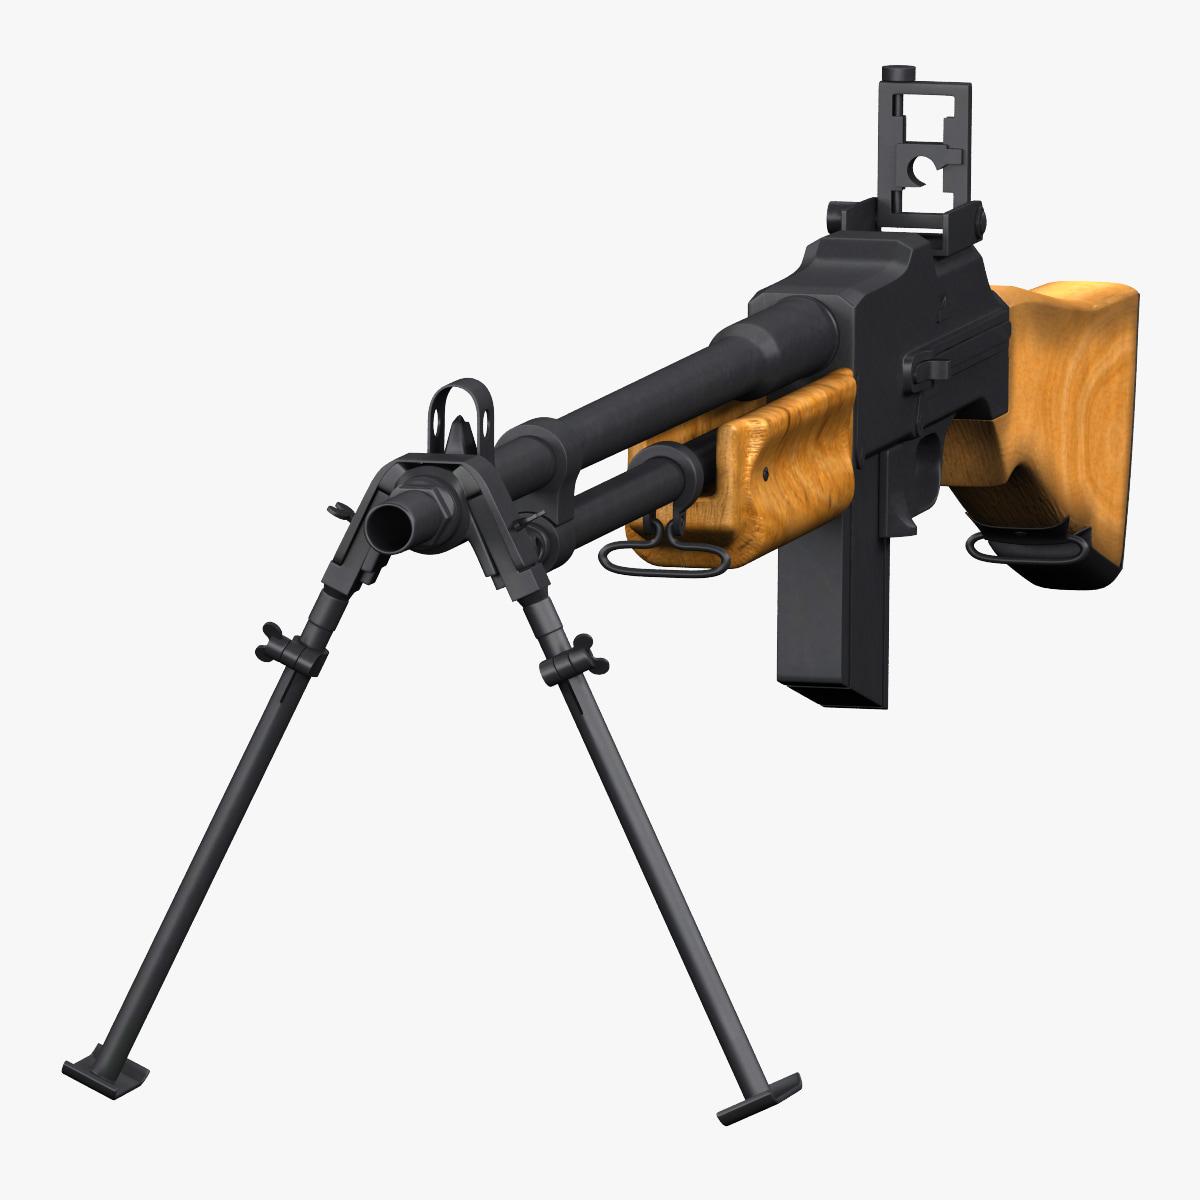 Browning_Automatic_Rifle_BAR_1918_A2_247.jpg